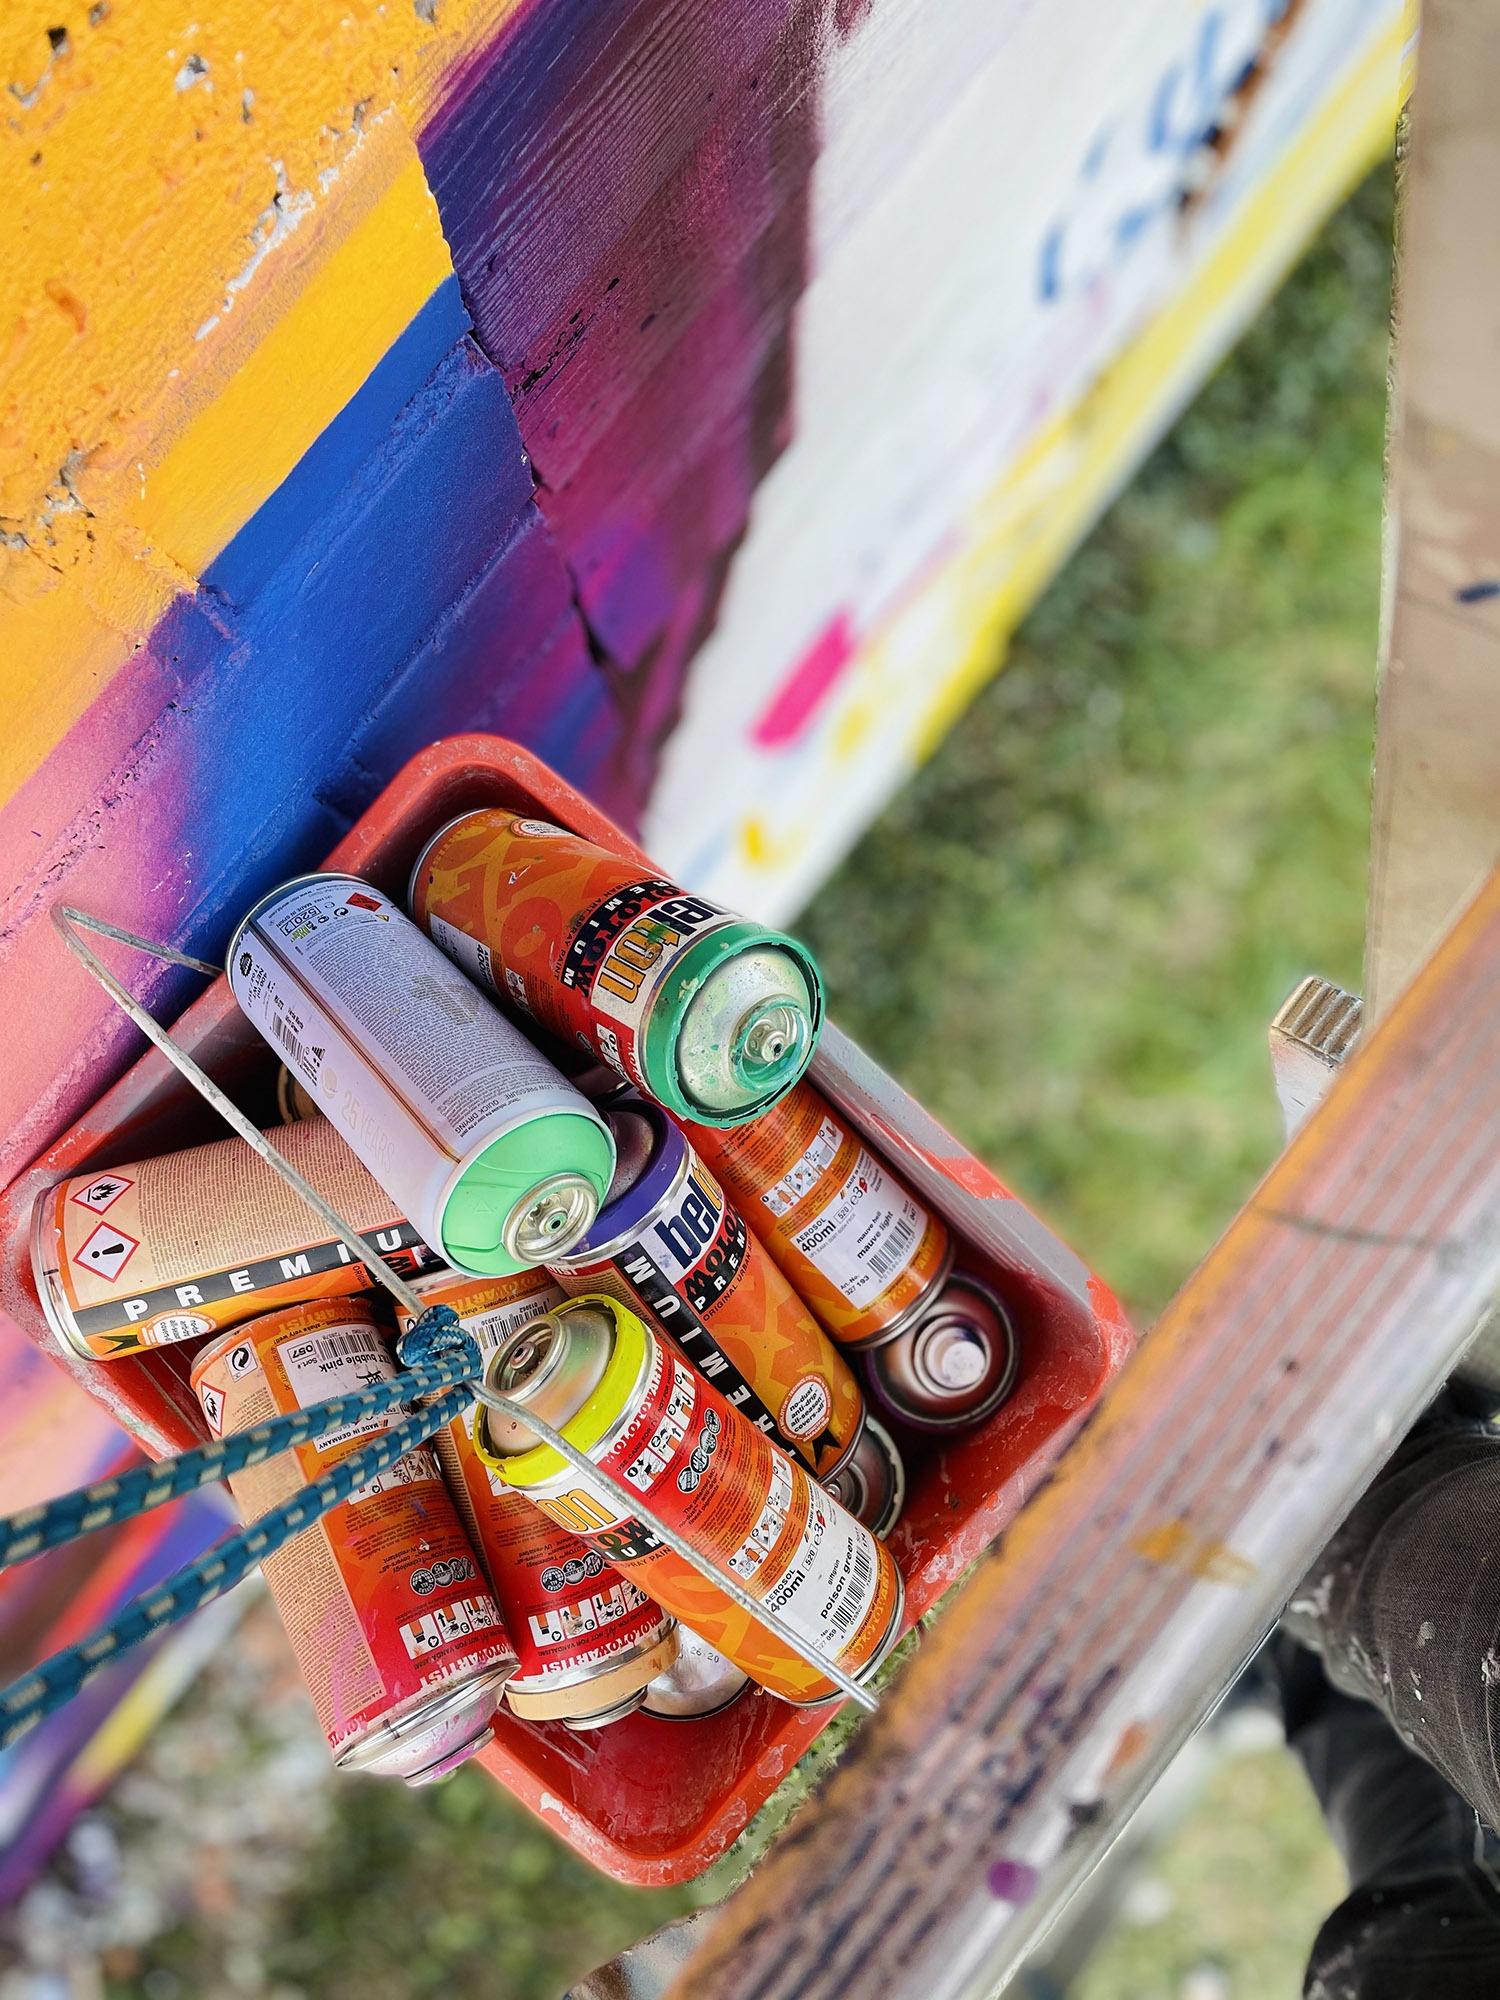 graffeur-toulouse-montauban-aerosol-graffiti